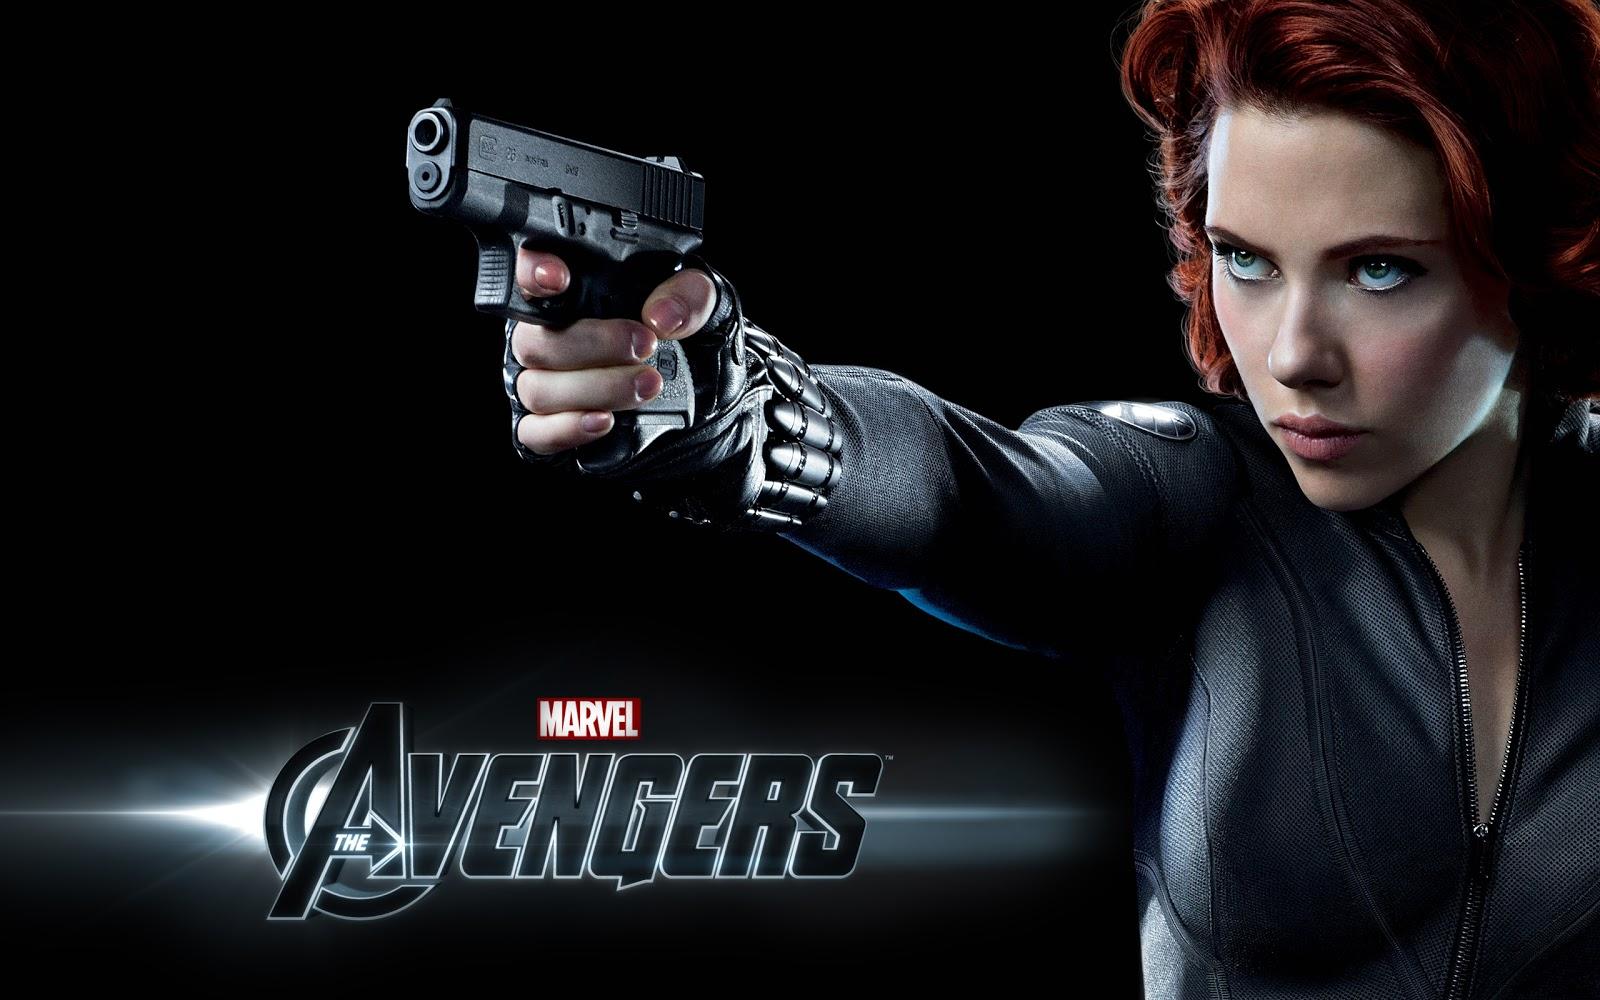 http://1.bp.blogspot.com/-Axt7-7mTMgQ/T6HxbKTDwrI/AAAAAAAADfo/yIv2Cjh-eJE/s1600/Scarlett-Johansson-Avengers-5.jpg